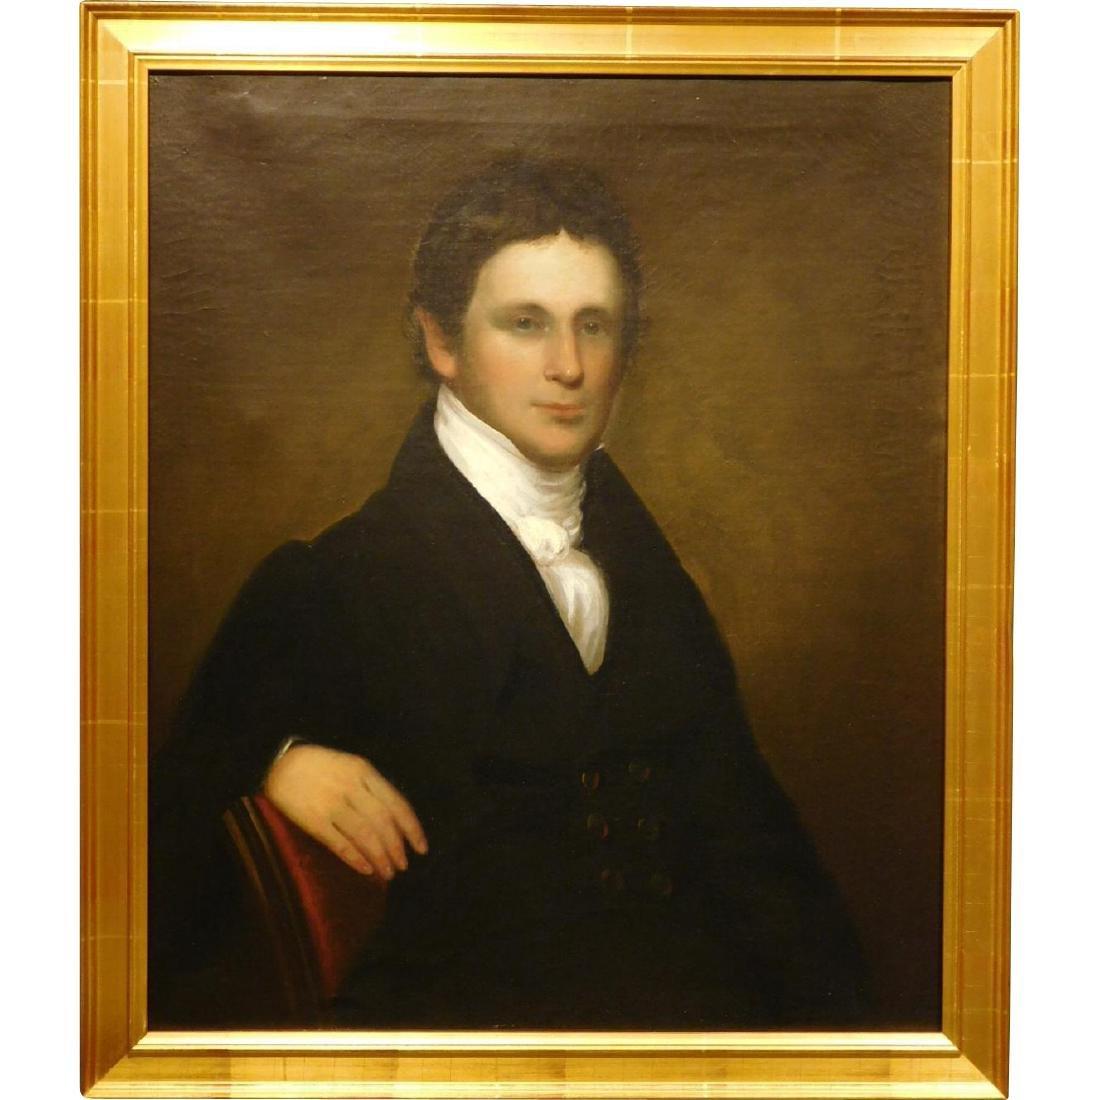 Antique Oil Portrait of a Handsome Young Man, c.1820